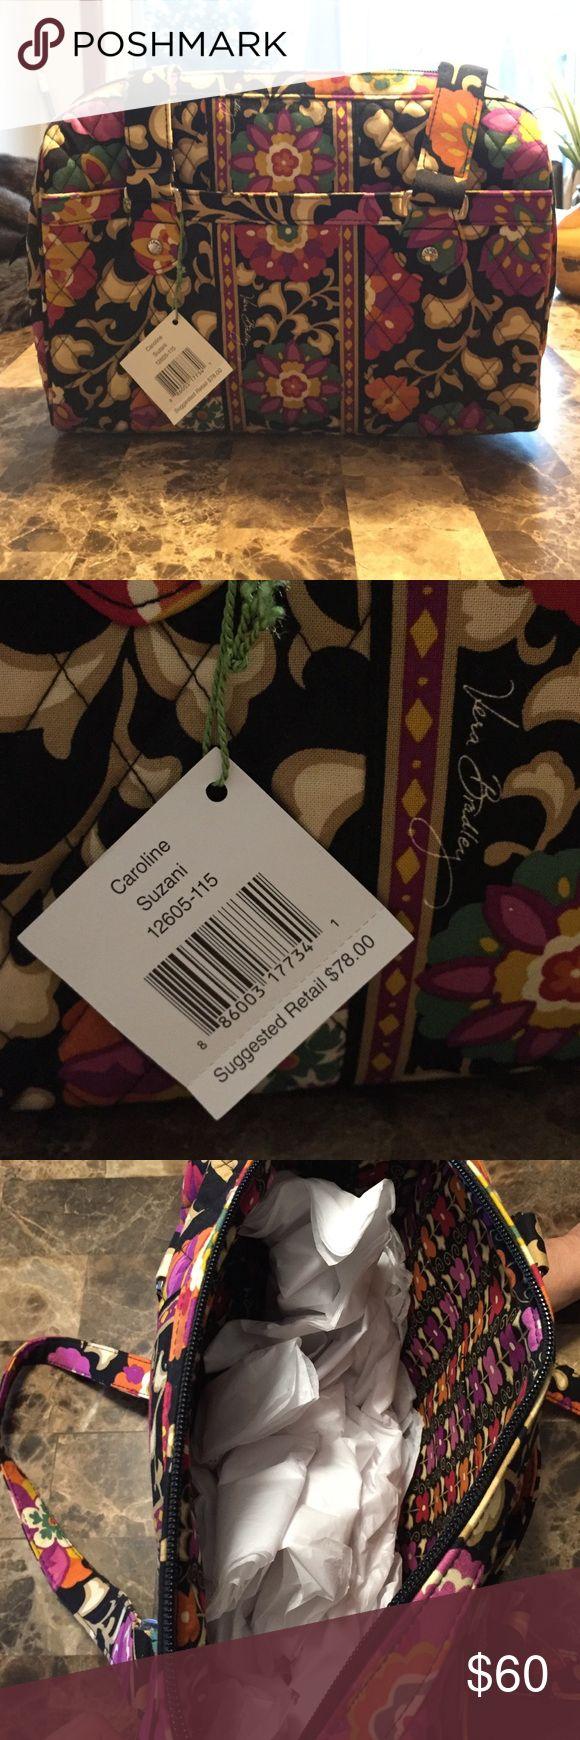 Vera Bradley tote bag/ pocketbook New tags still attached, stylish Vera Bradley bag make an offer! Vera Bradley Bags Totes